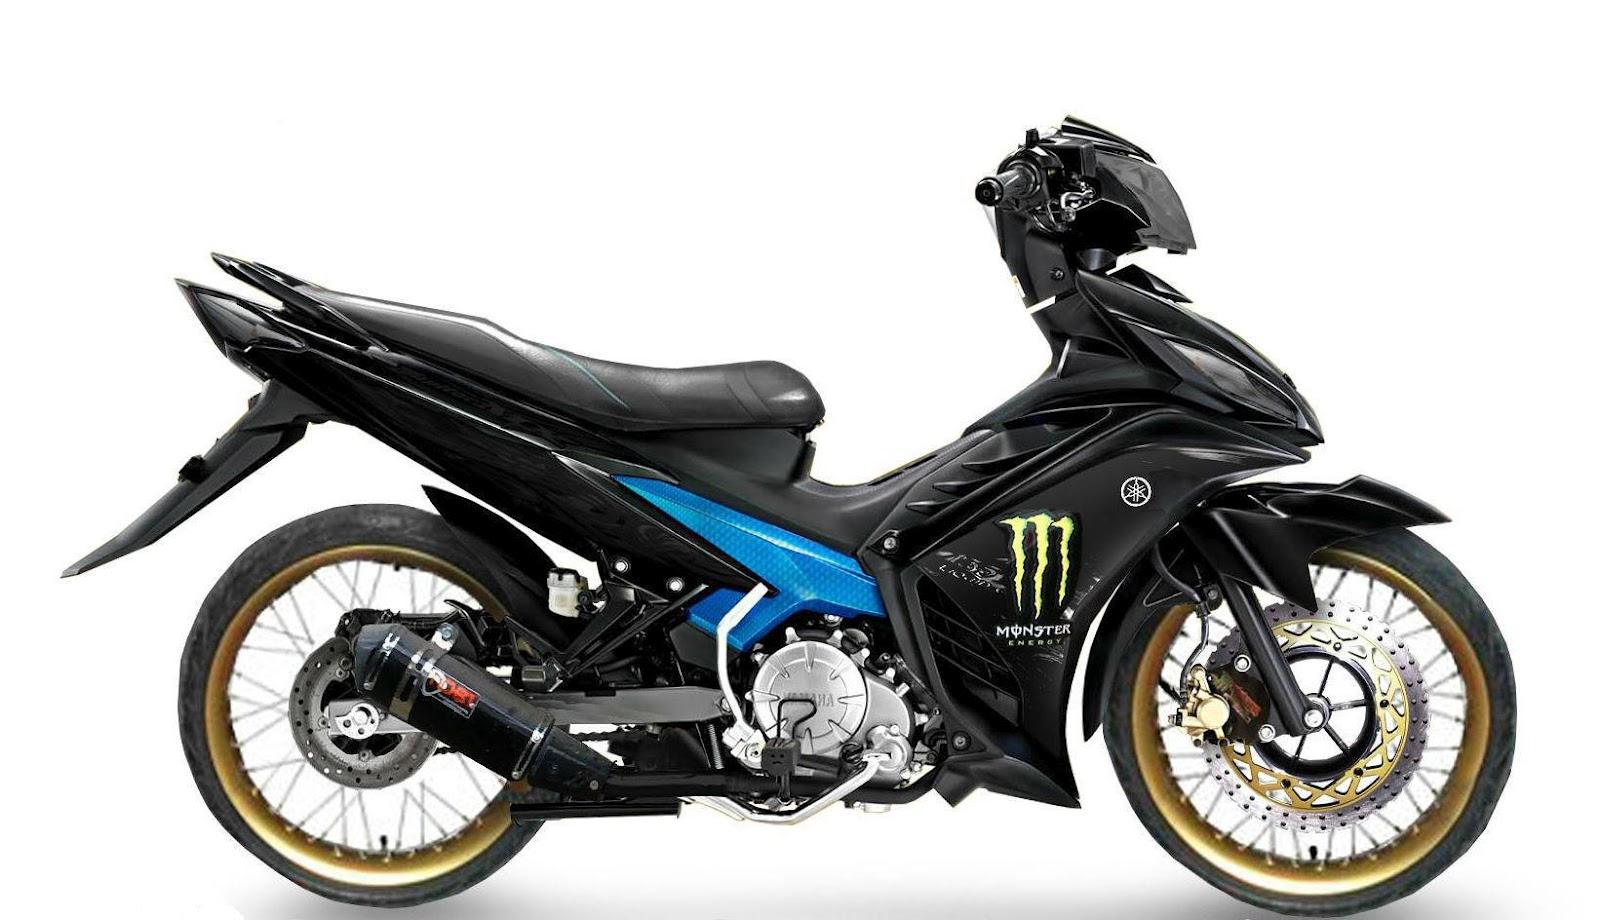 L300 Full Variasi >> Gambar motor modif jupiter mx sederhana 135 king airbrush ala road race thailand 2018